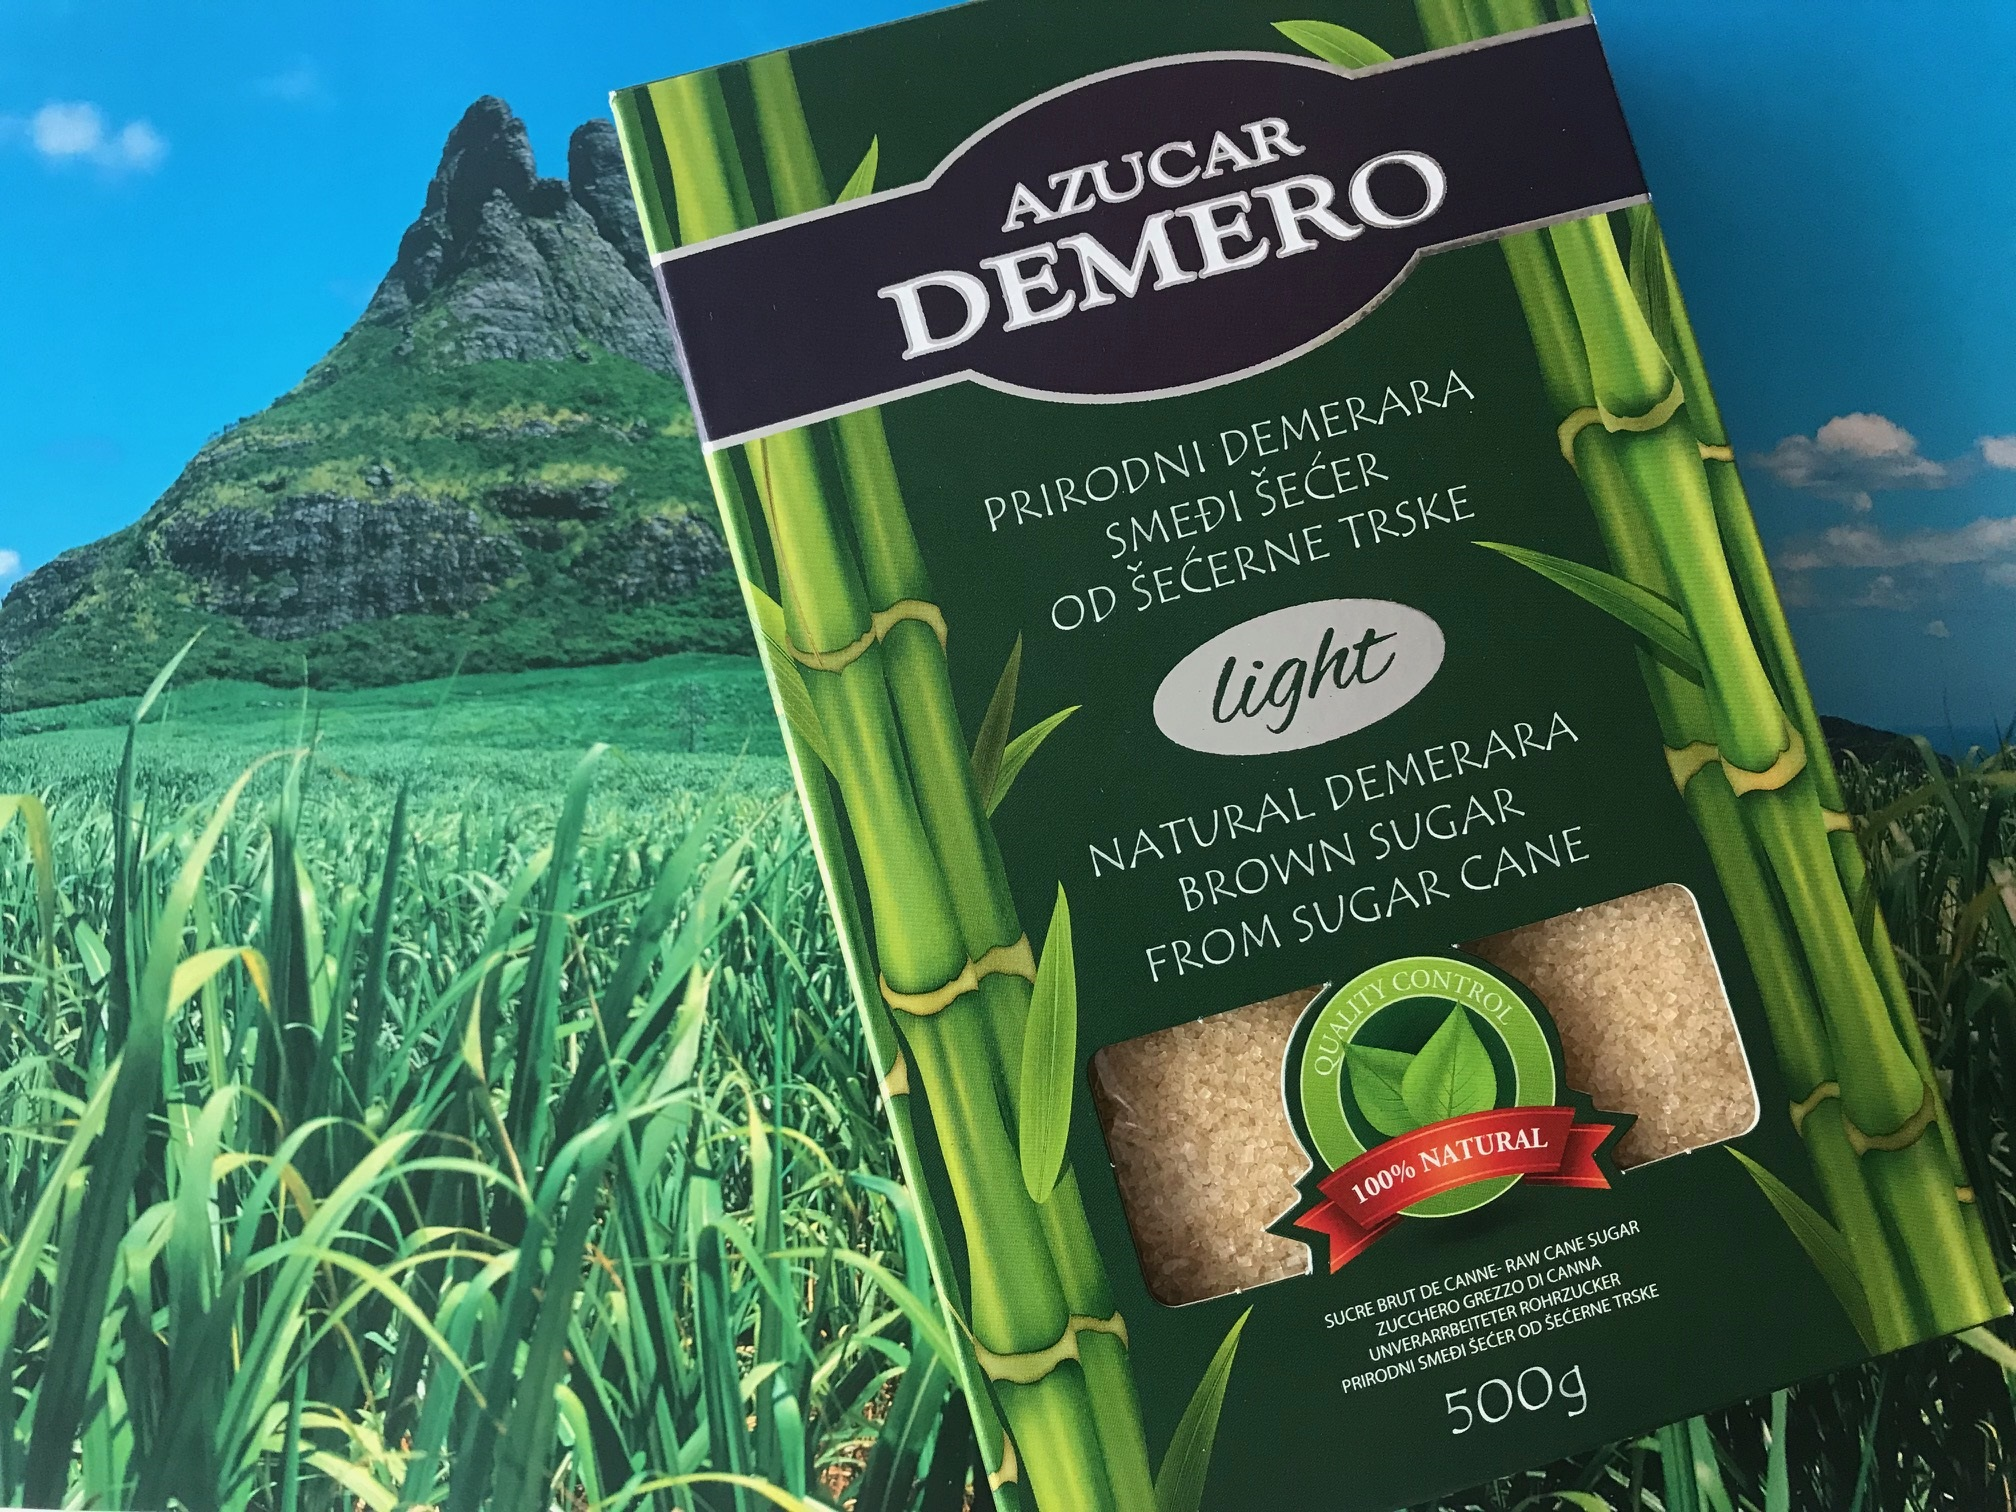 Zimske poslastice uz Azucar Demero smeđi light šećer